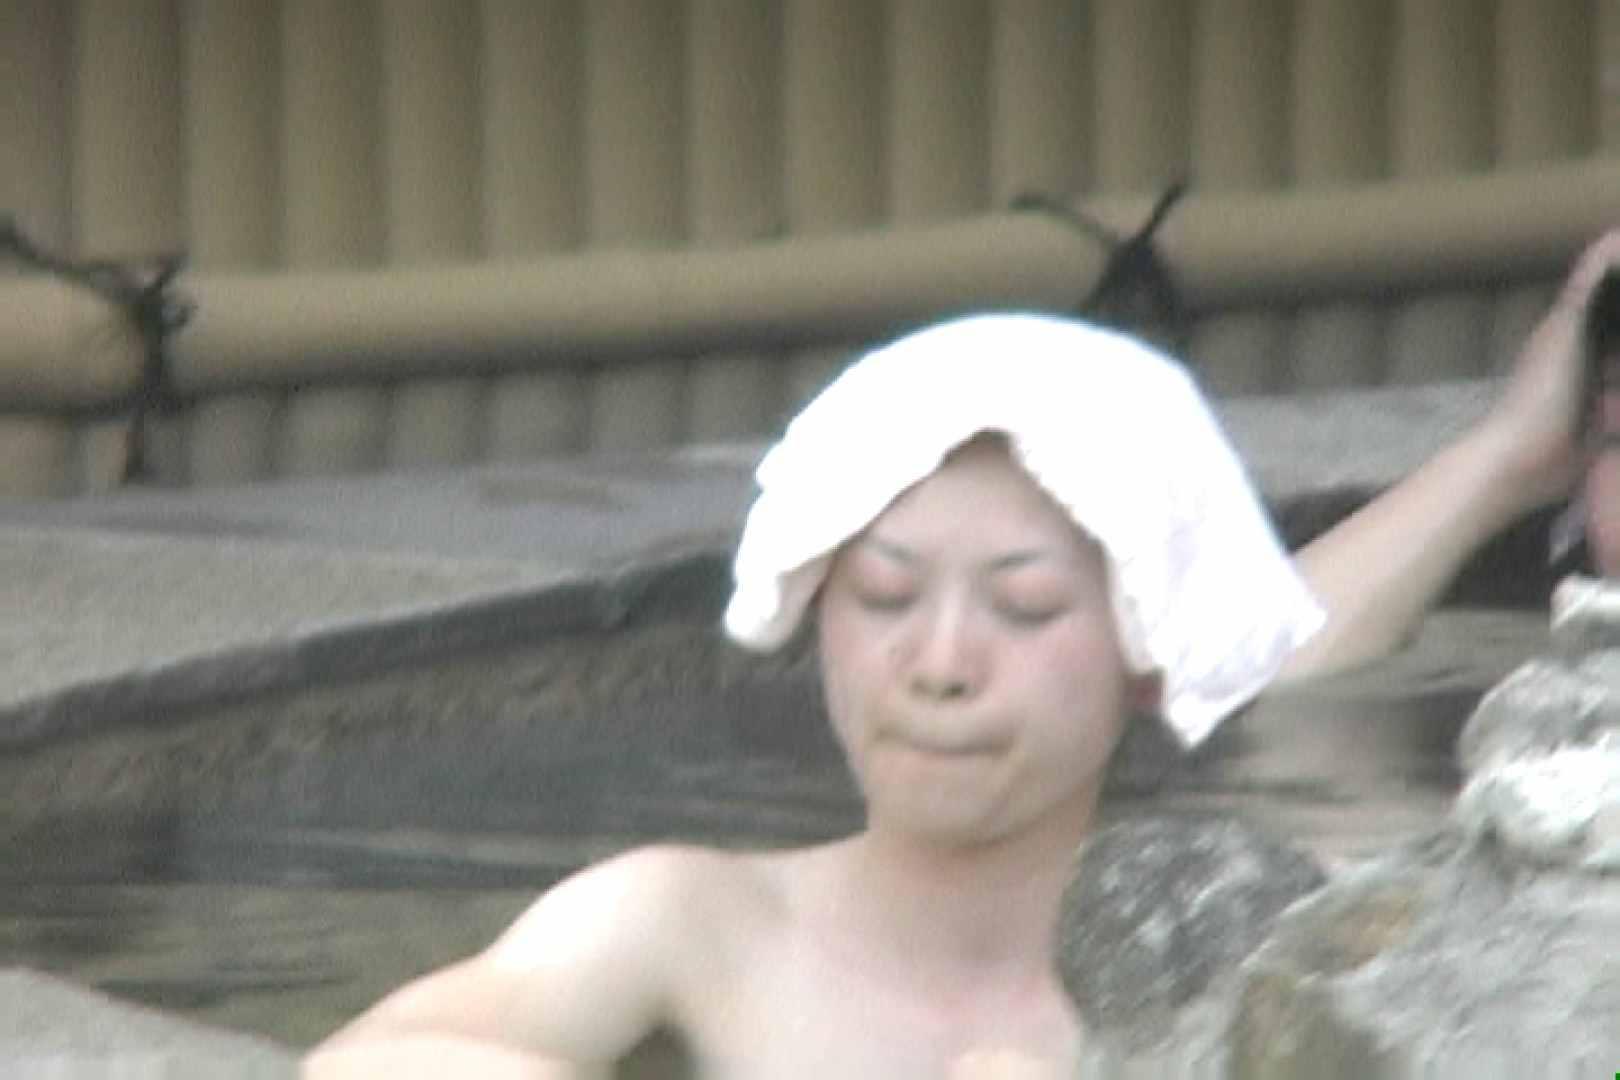 Aquaな露天風呂Vol.693 露天 | HなOL  76pic 32